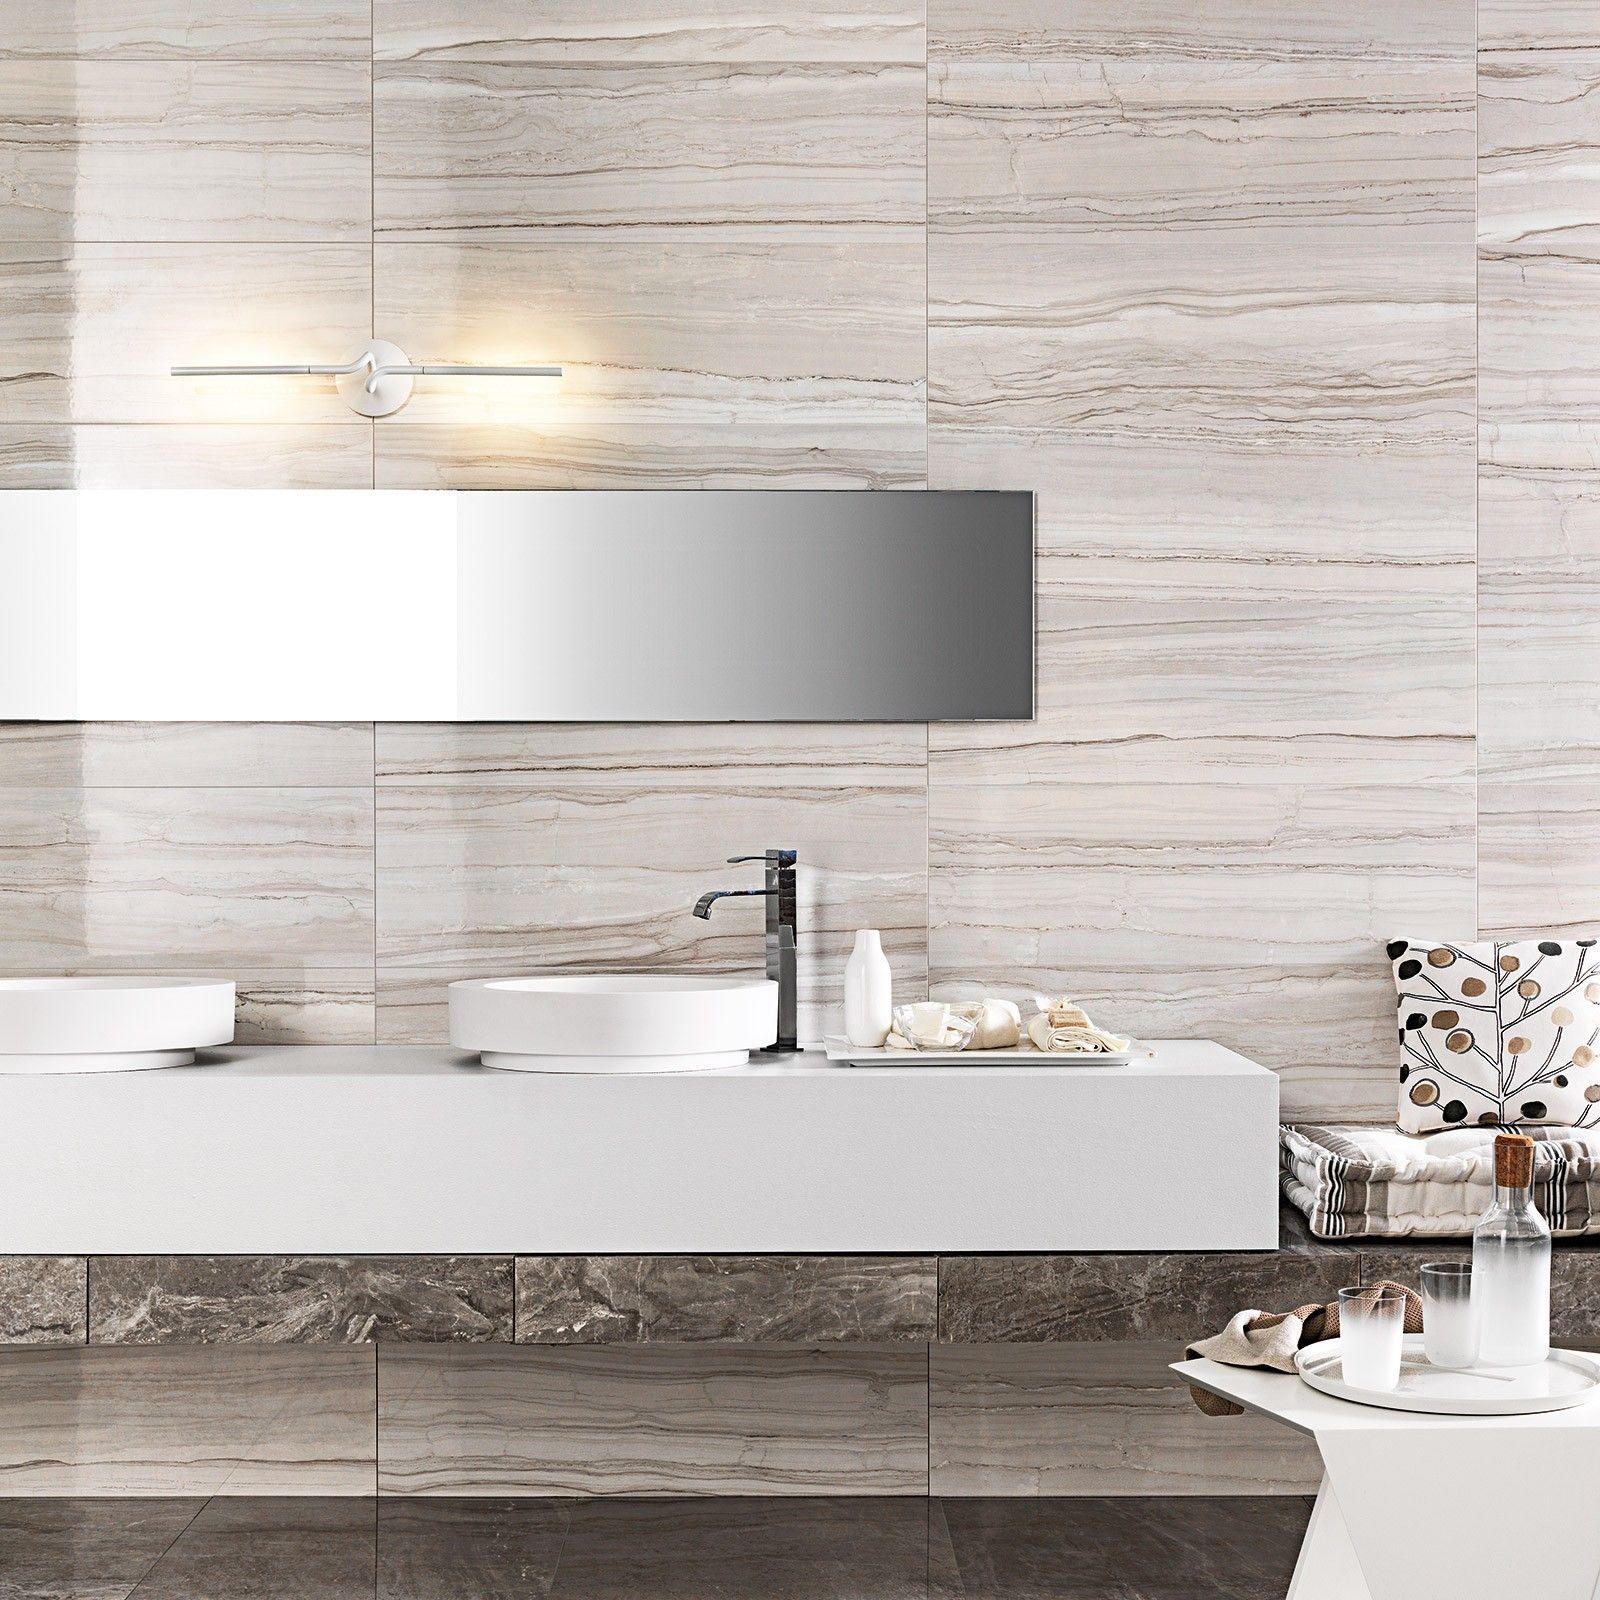 Marmi Elegance Striato Rectified Wall Tile Bathroom Wall Tile